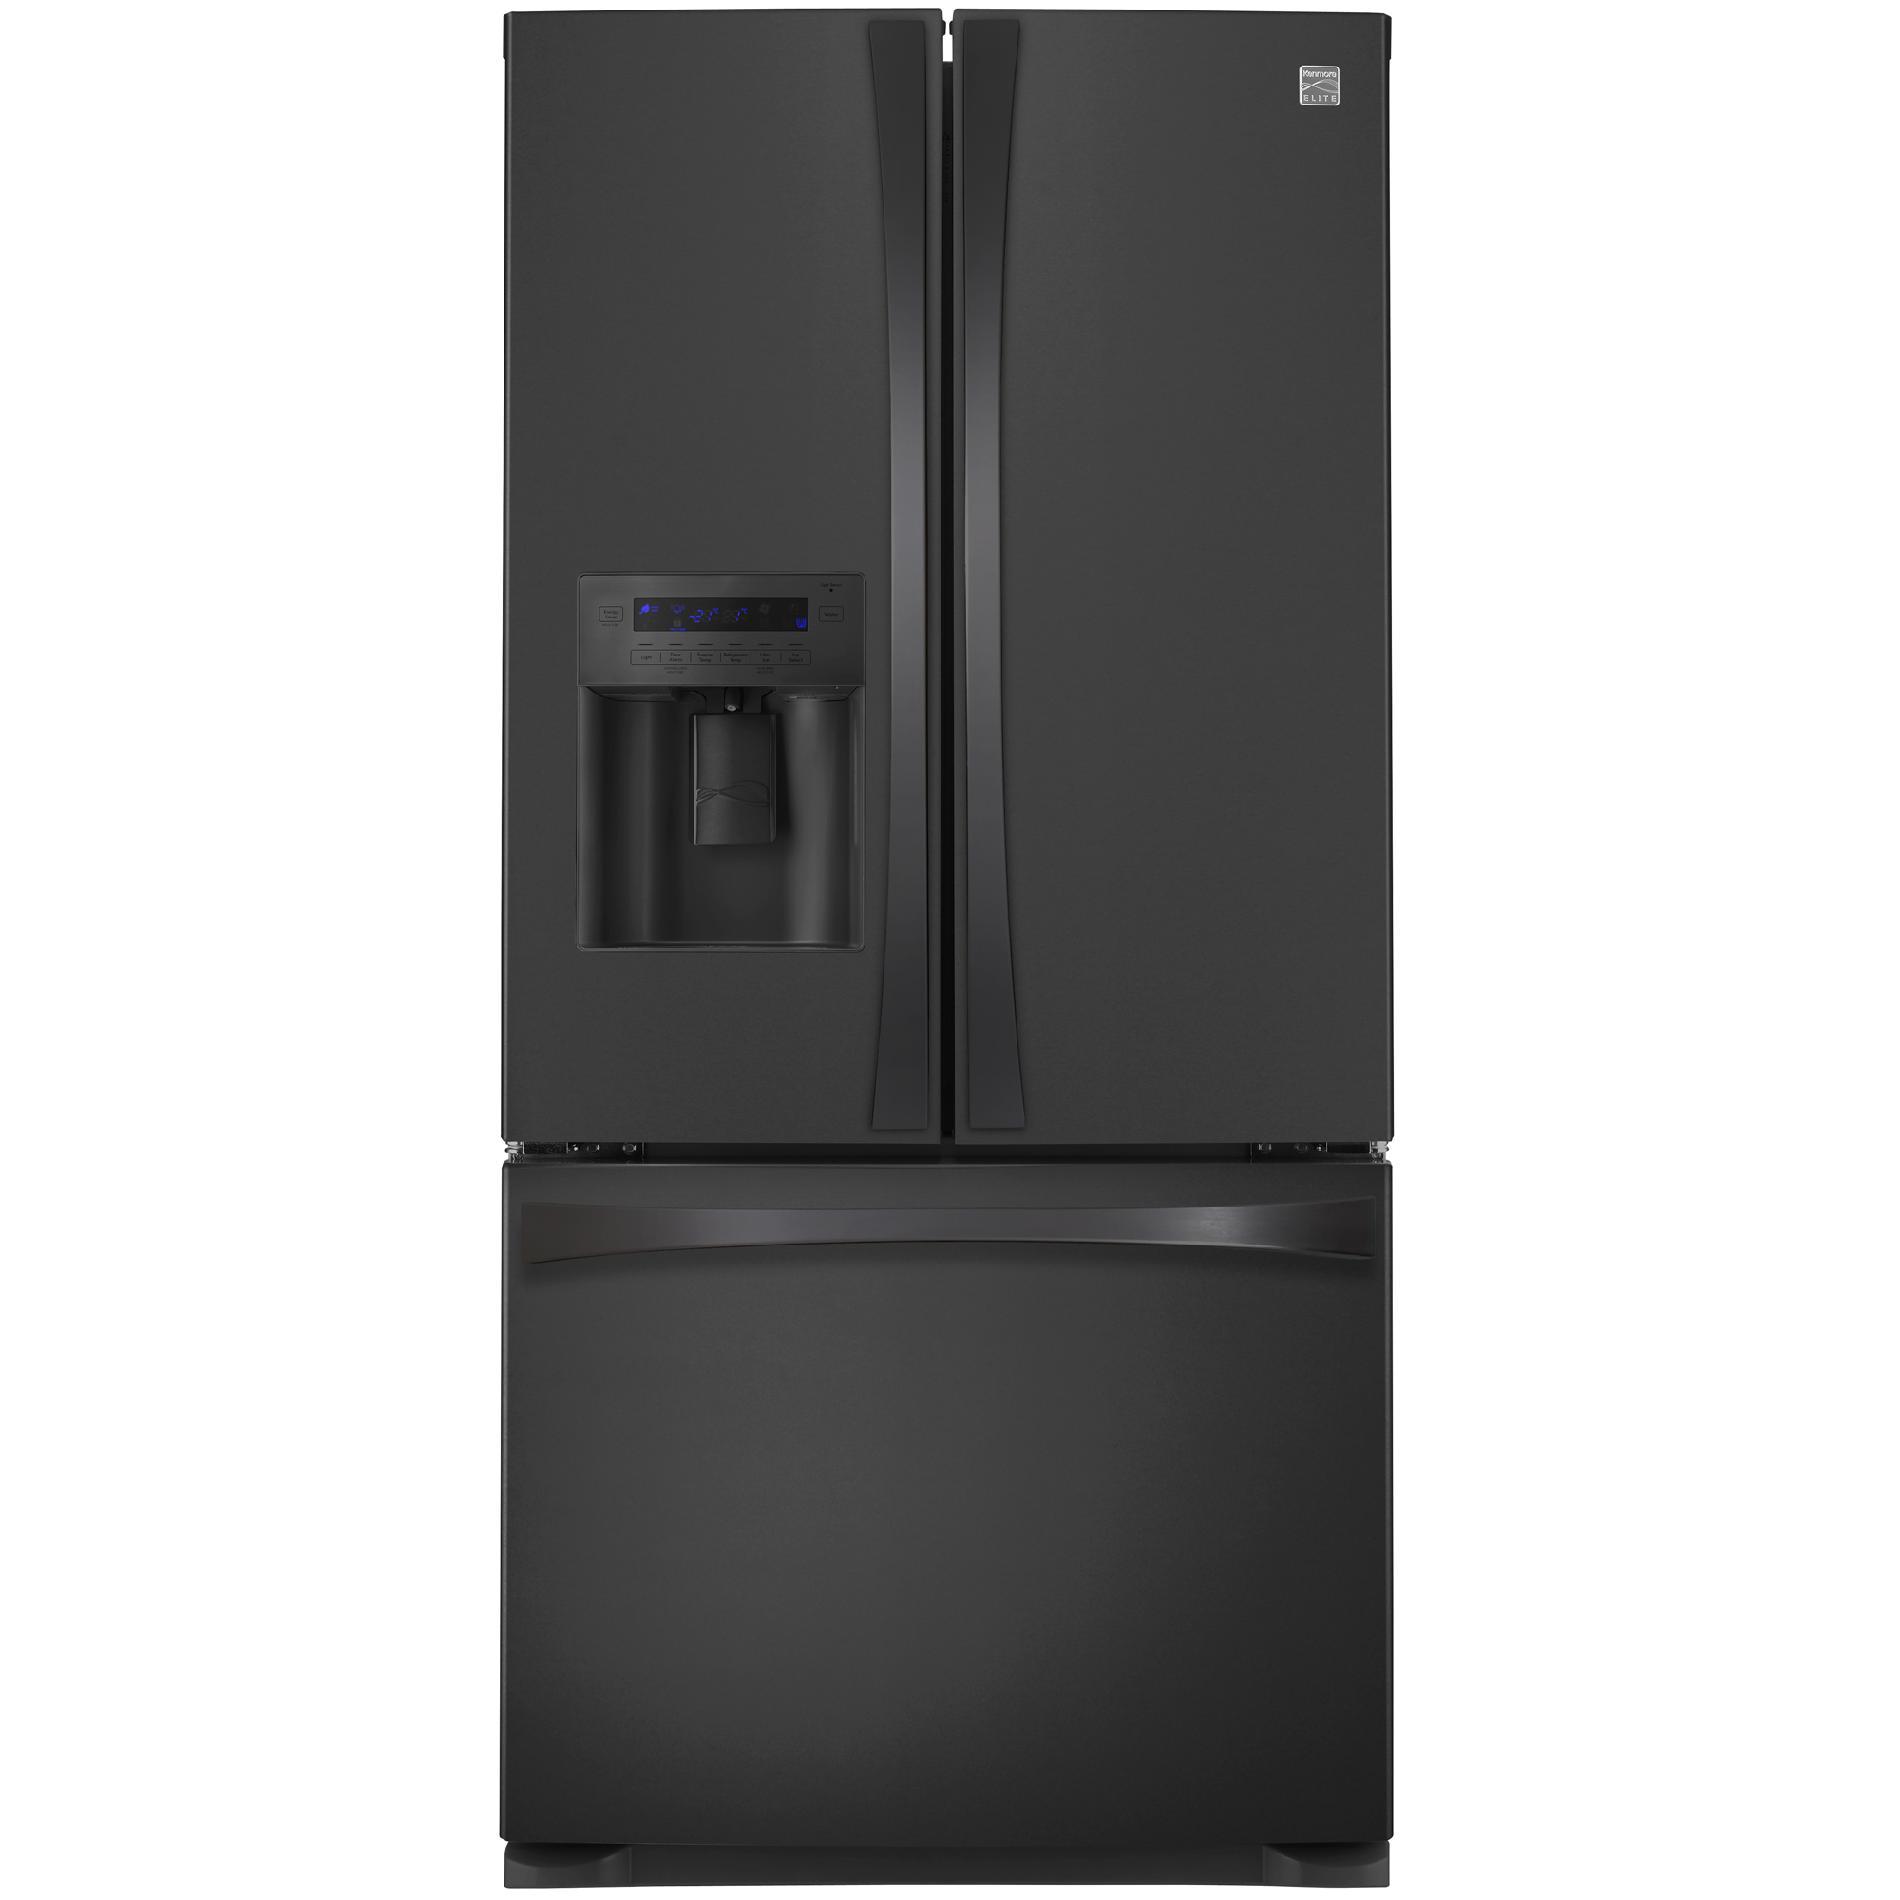 Kenmore 106 Refrigerator Specifications